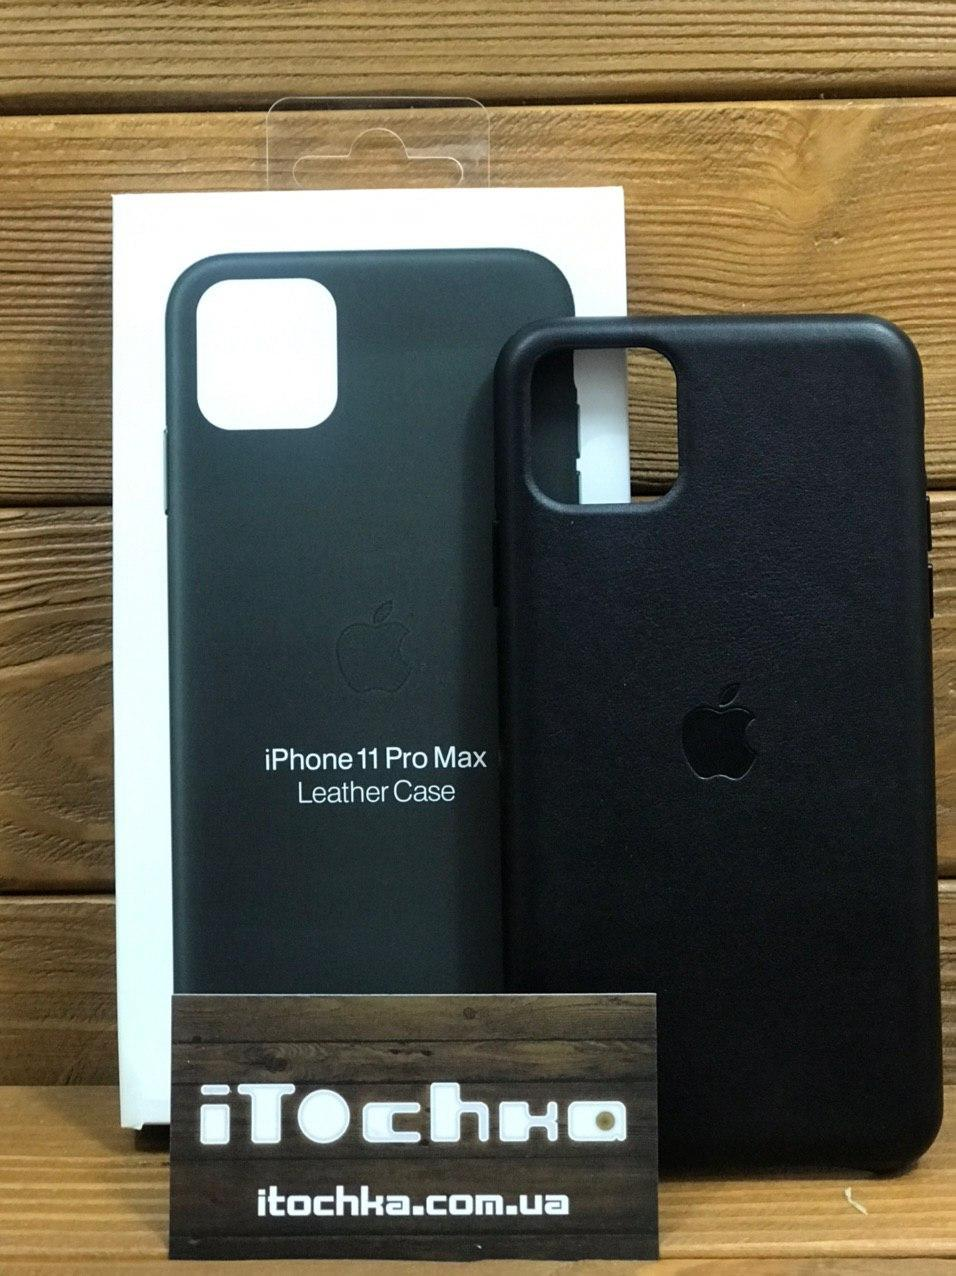 Чехол для iPhone Apple iPhone 11 Pro Max Leather Case Black